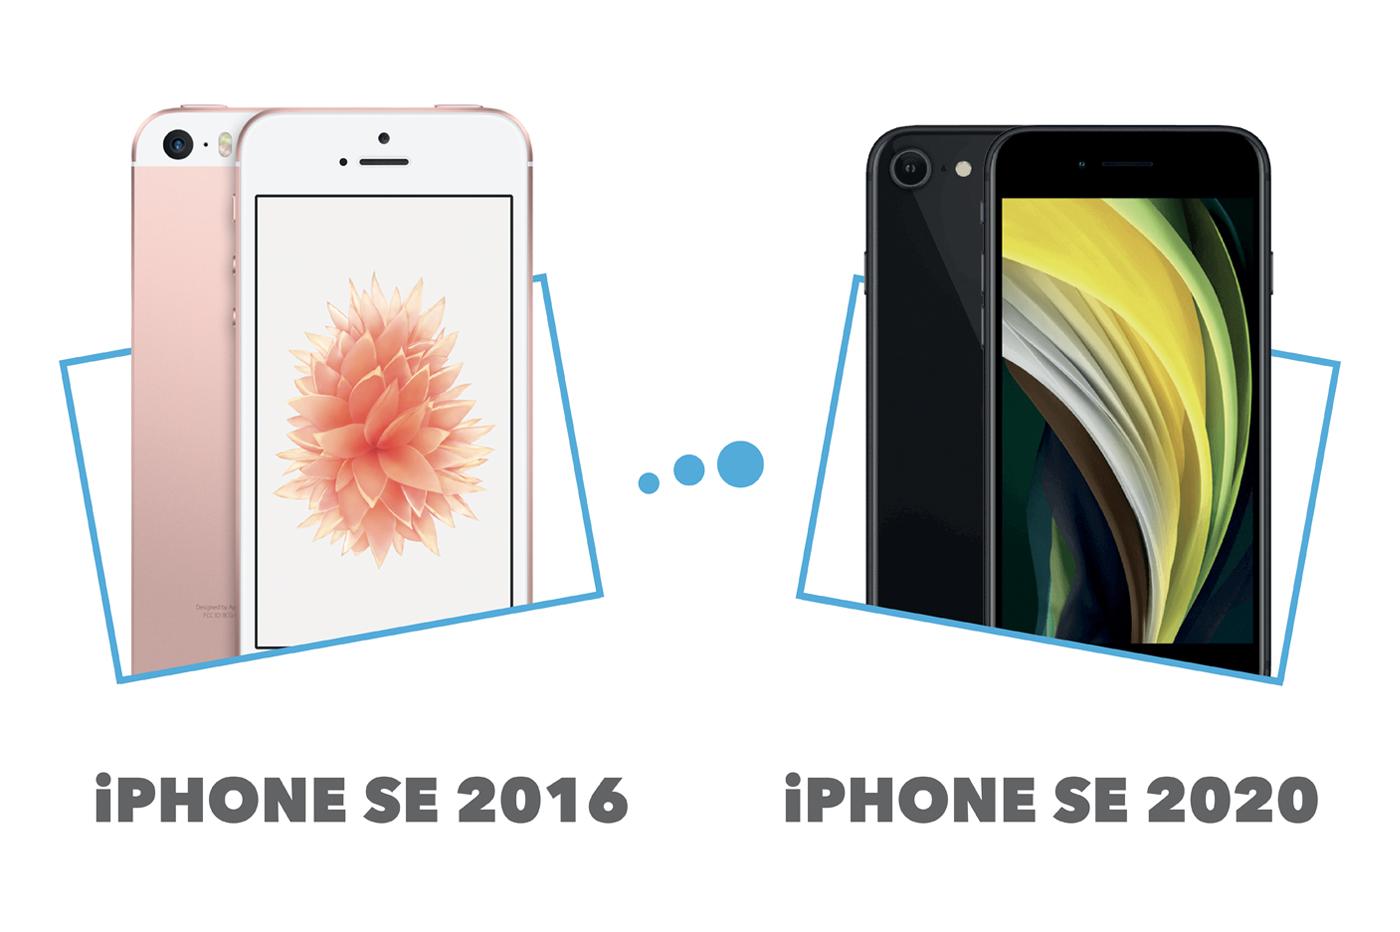 Comparatif iPhone SE 2016 vs iPhone SE 2020